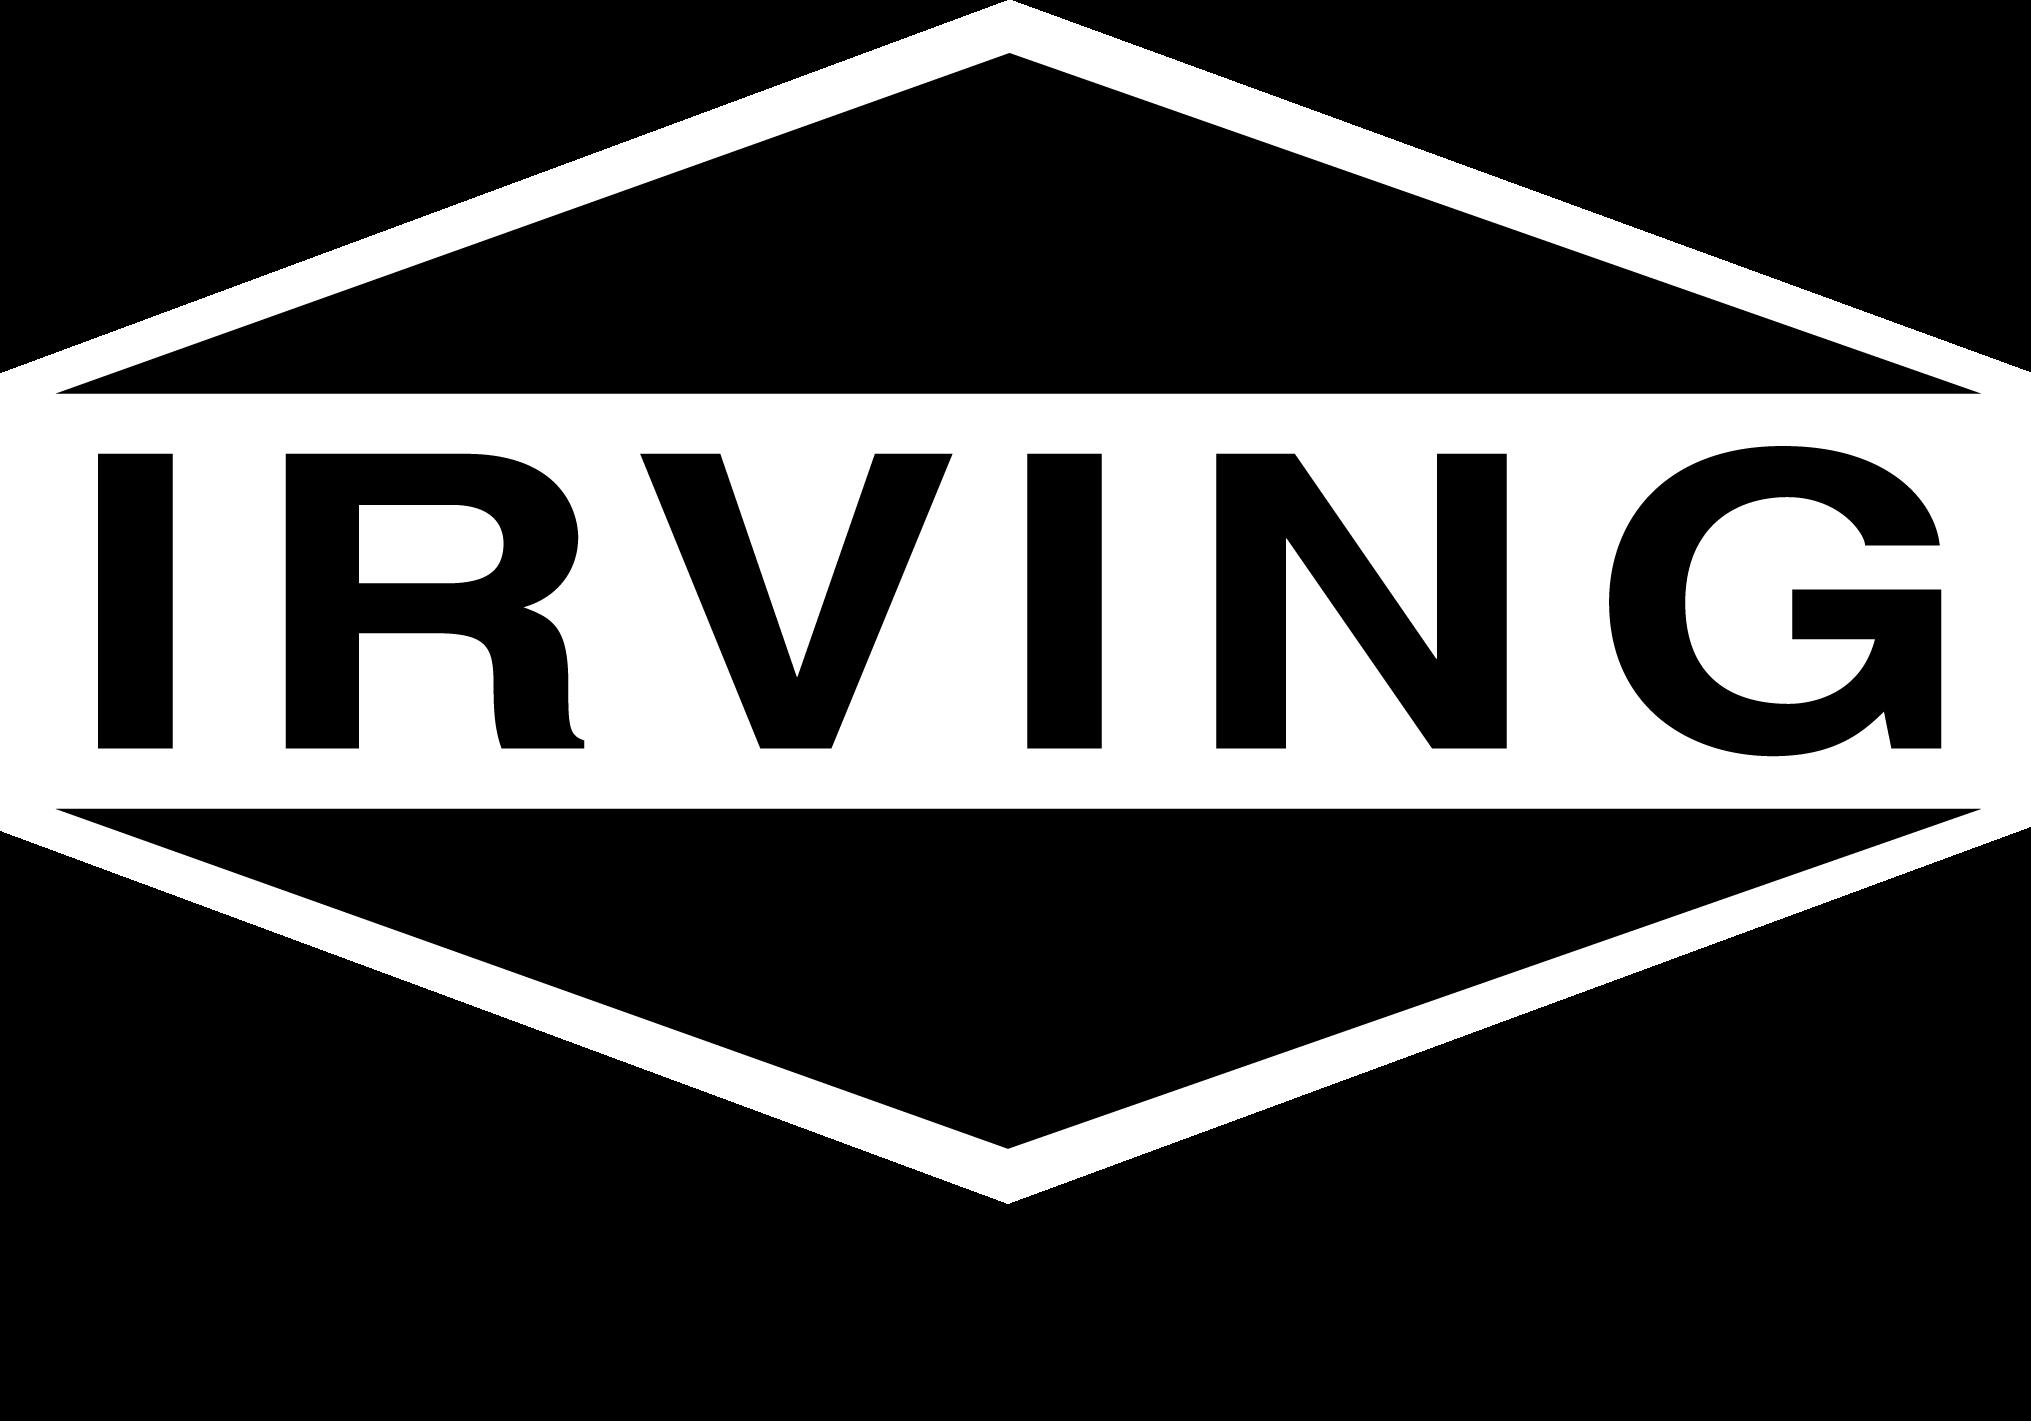 JD Irving Limited_R_BLK